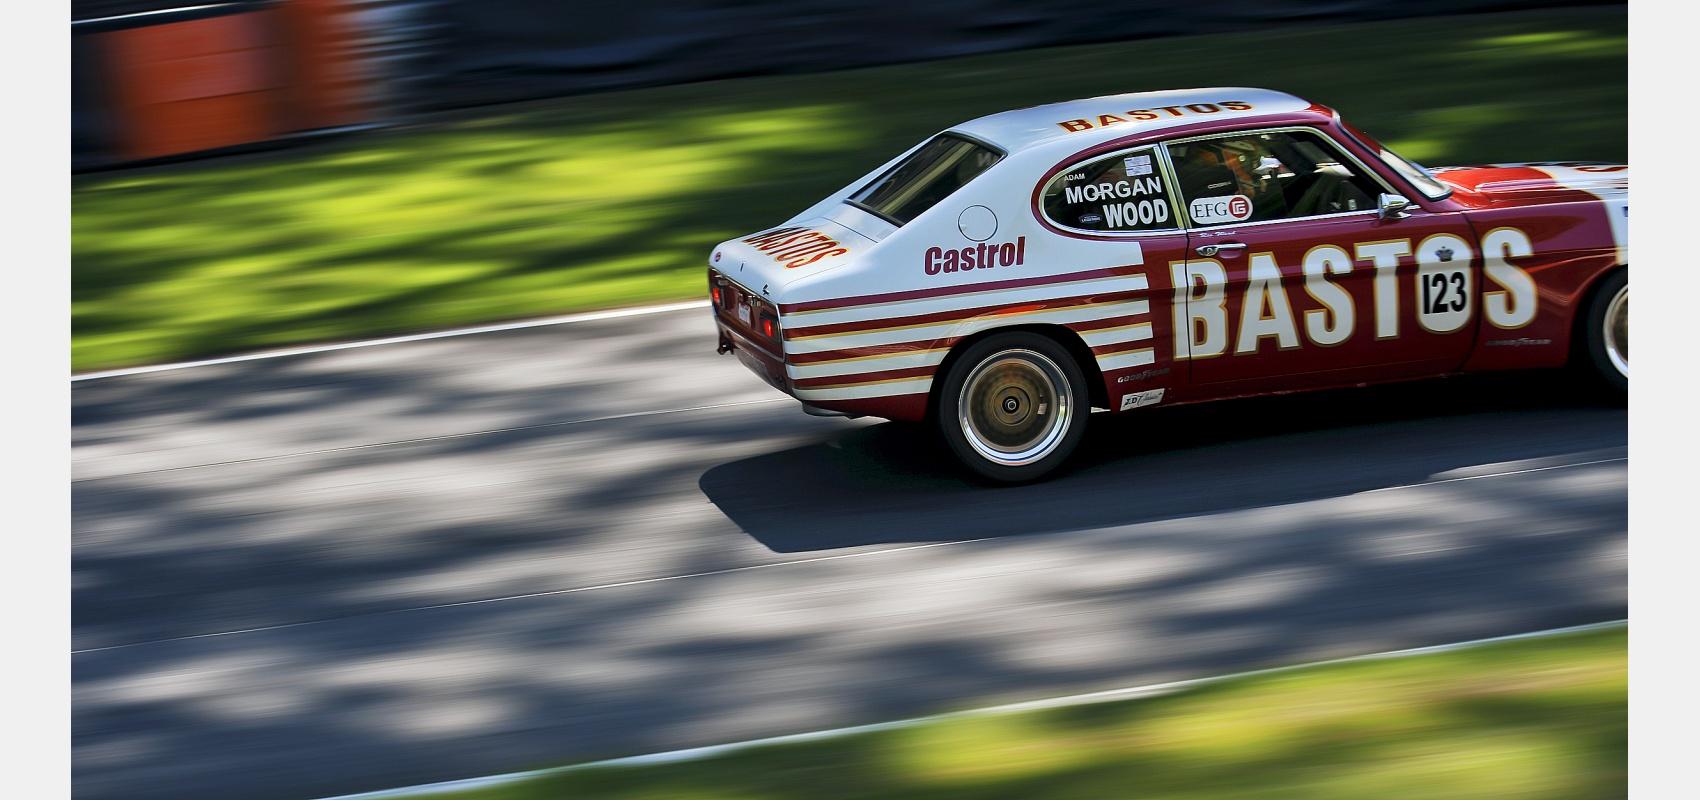 Motorsport - 1972 Ford Capri Weslake RS2600 racing through dappled light.